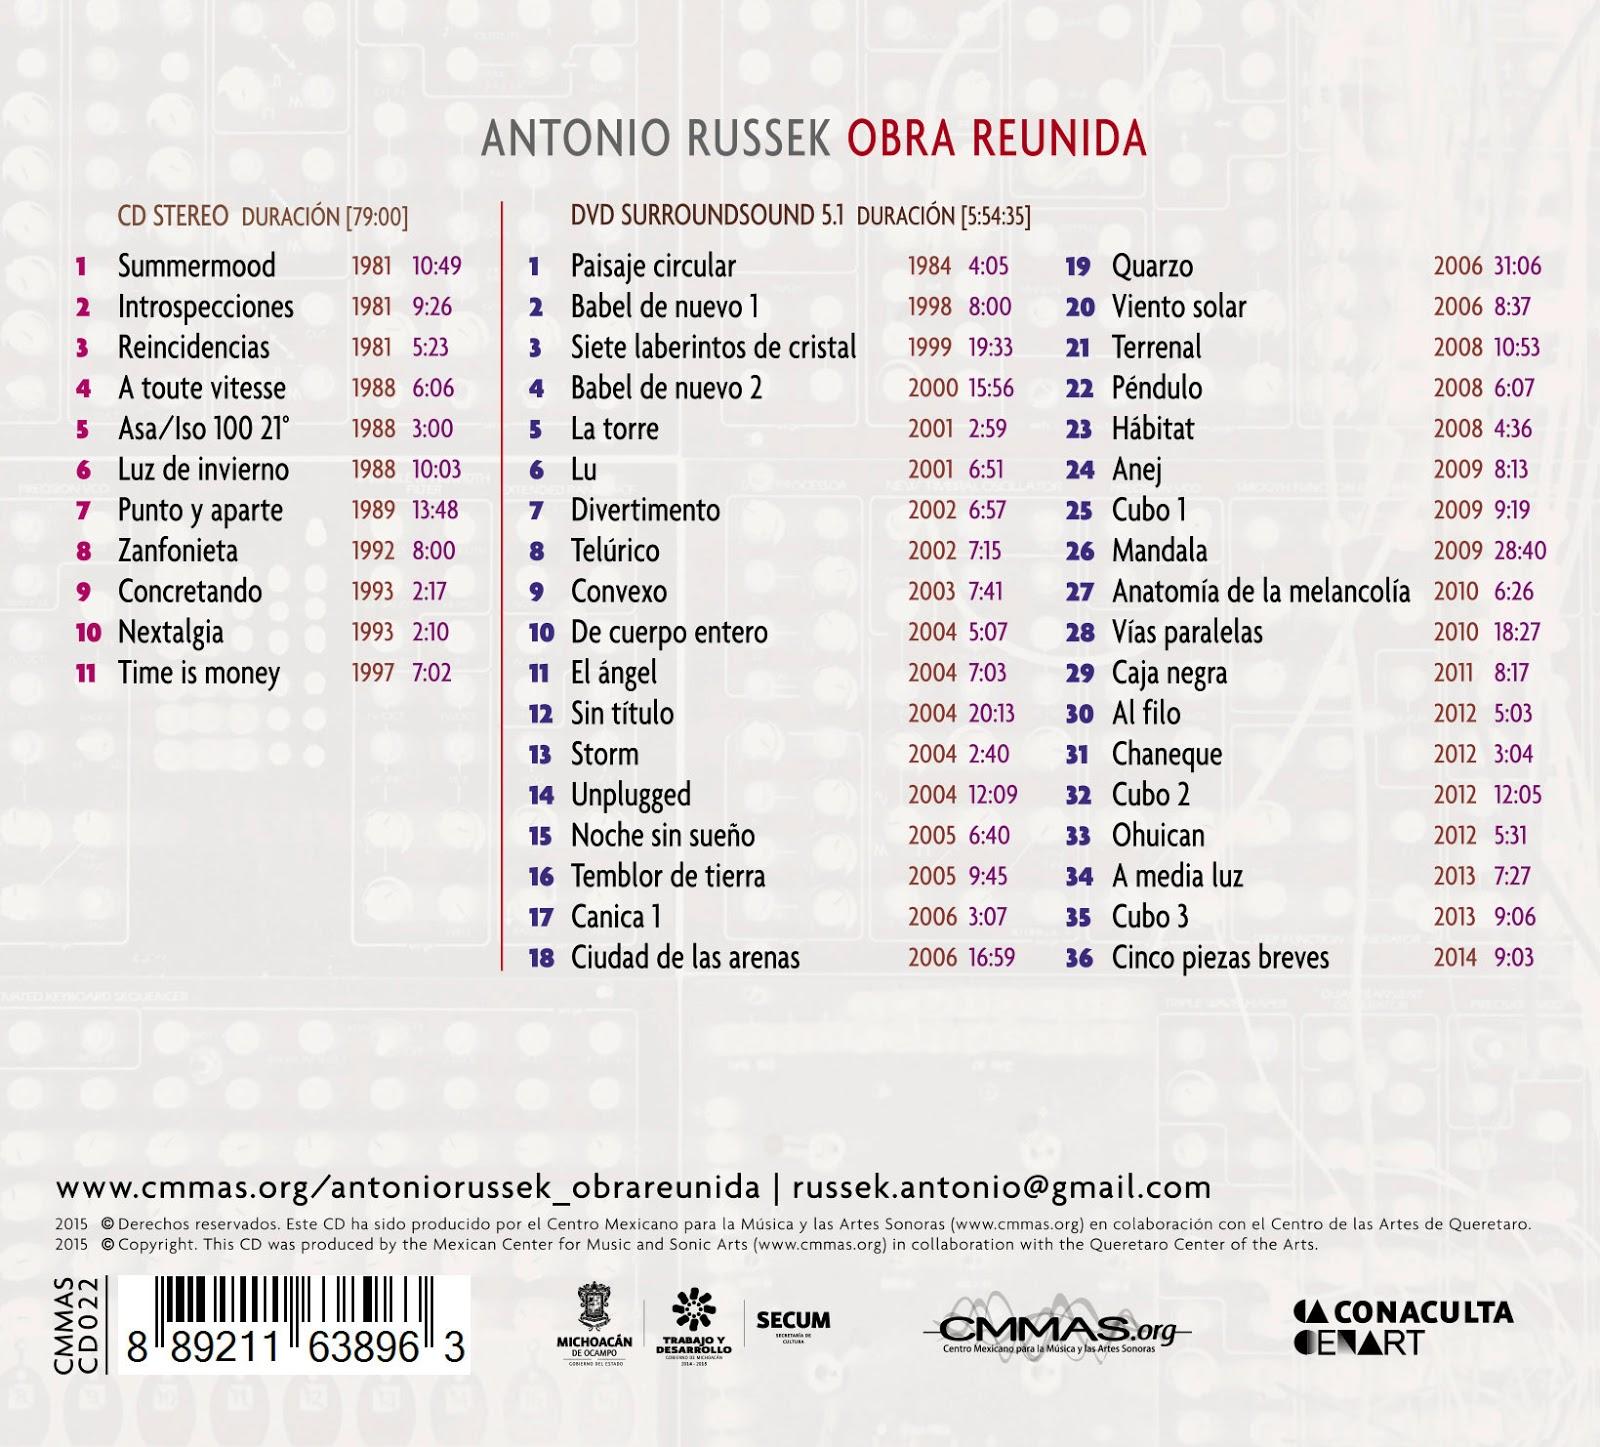 Cabeza de Moog !: Antonio Russek - Obra Reunida (CD - DVD - 2014)